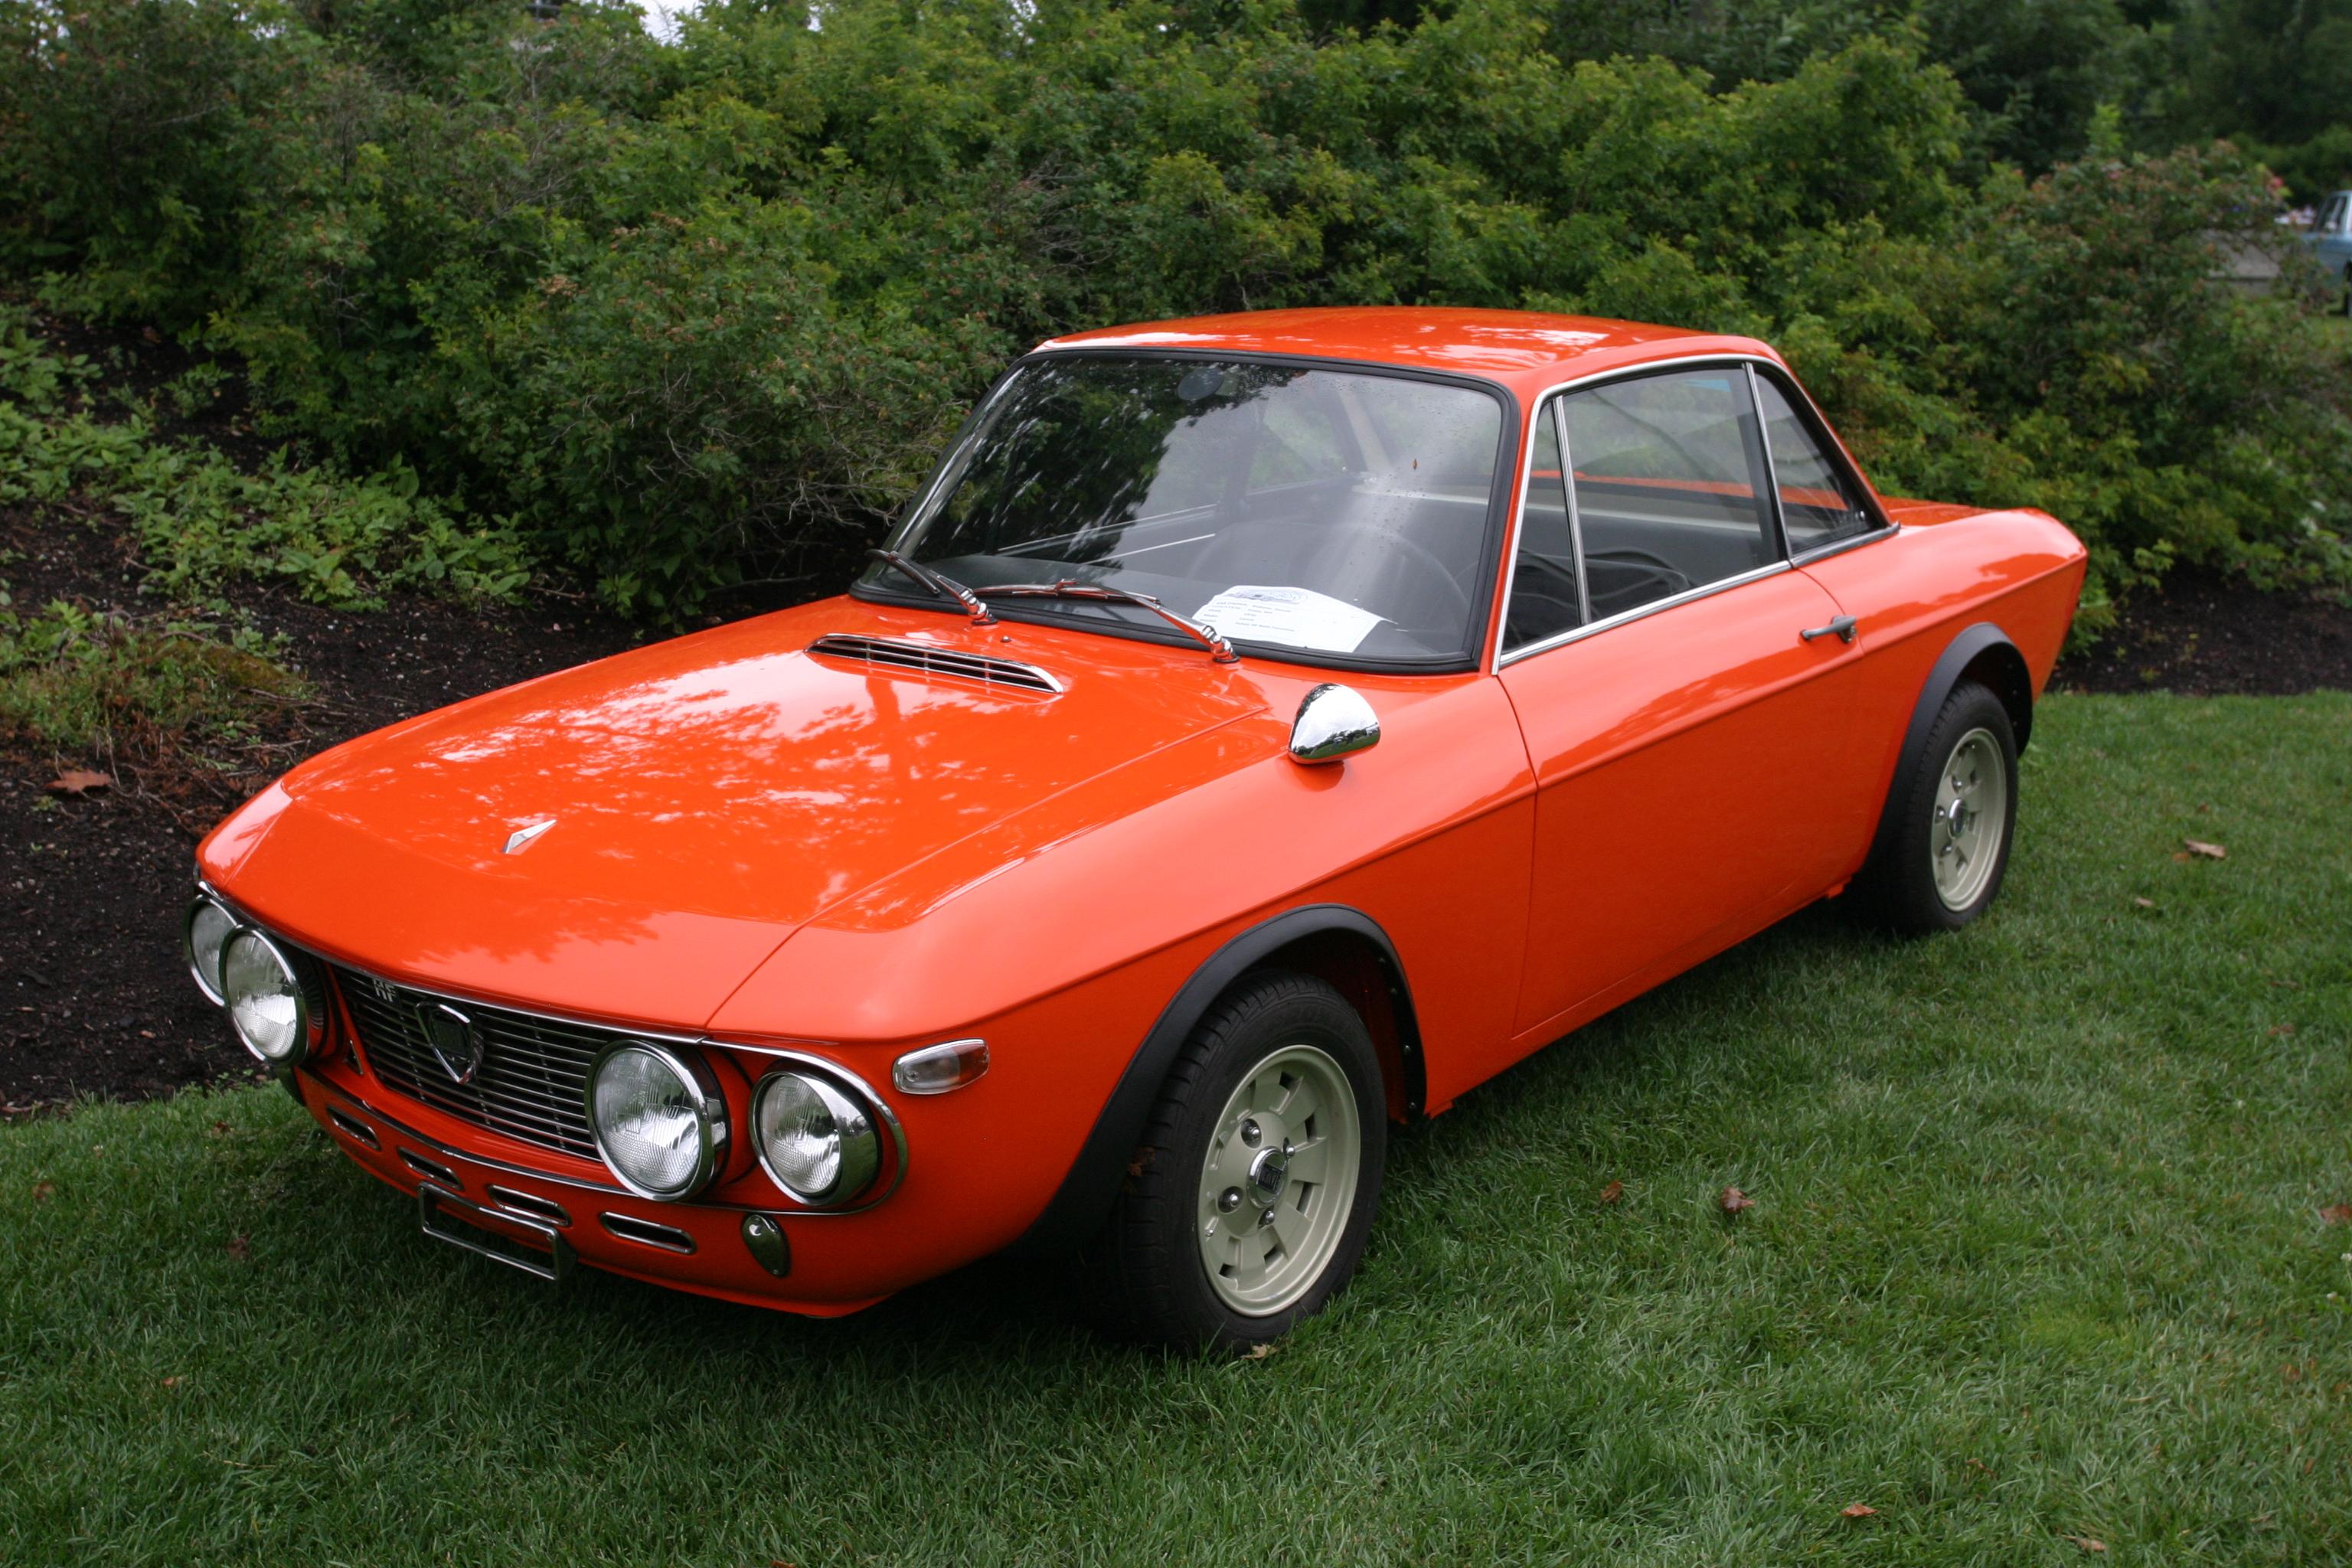 Lancia_Fulvia_HF_Fanalone_1970_-_0.jpg